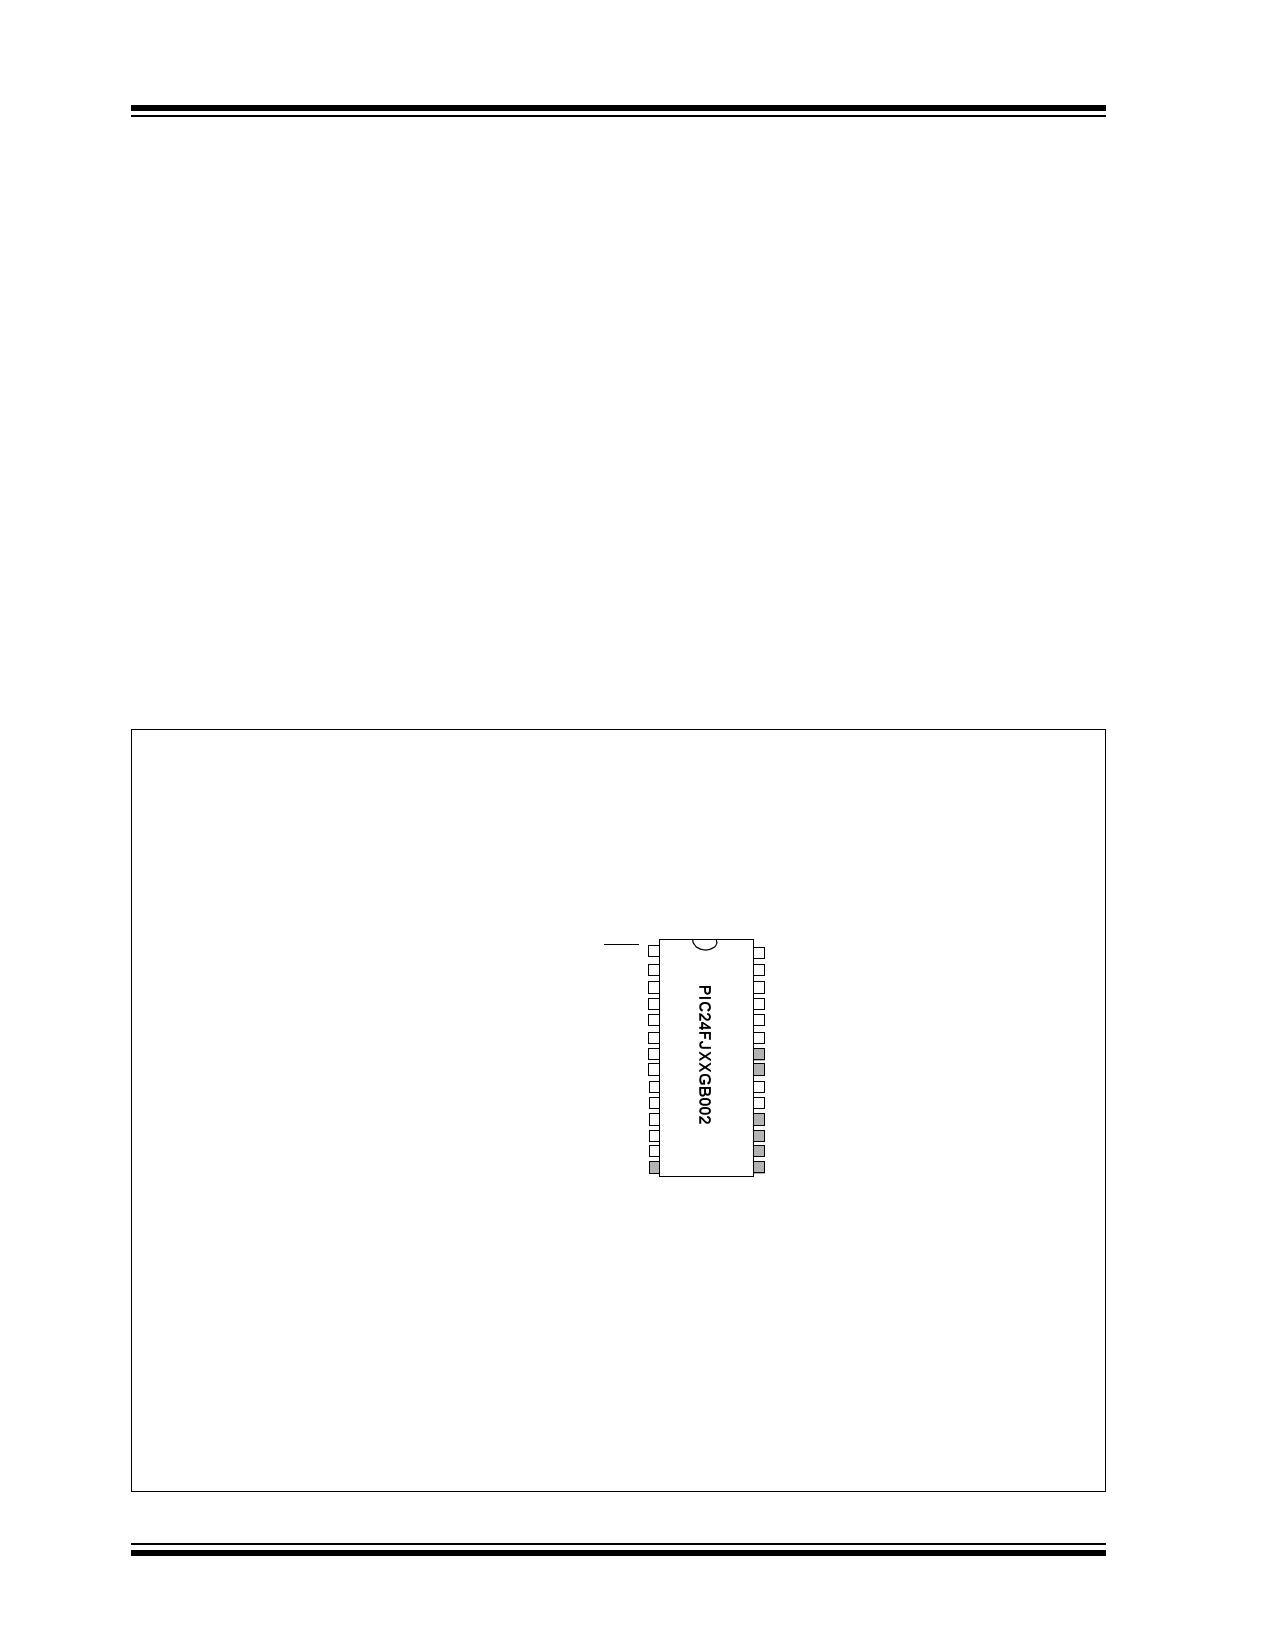 PIC24FJ32GB002 pdf, 반도체, 판매, 대치품